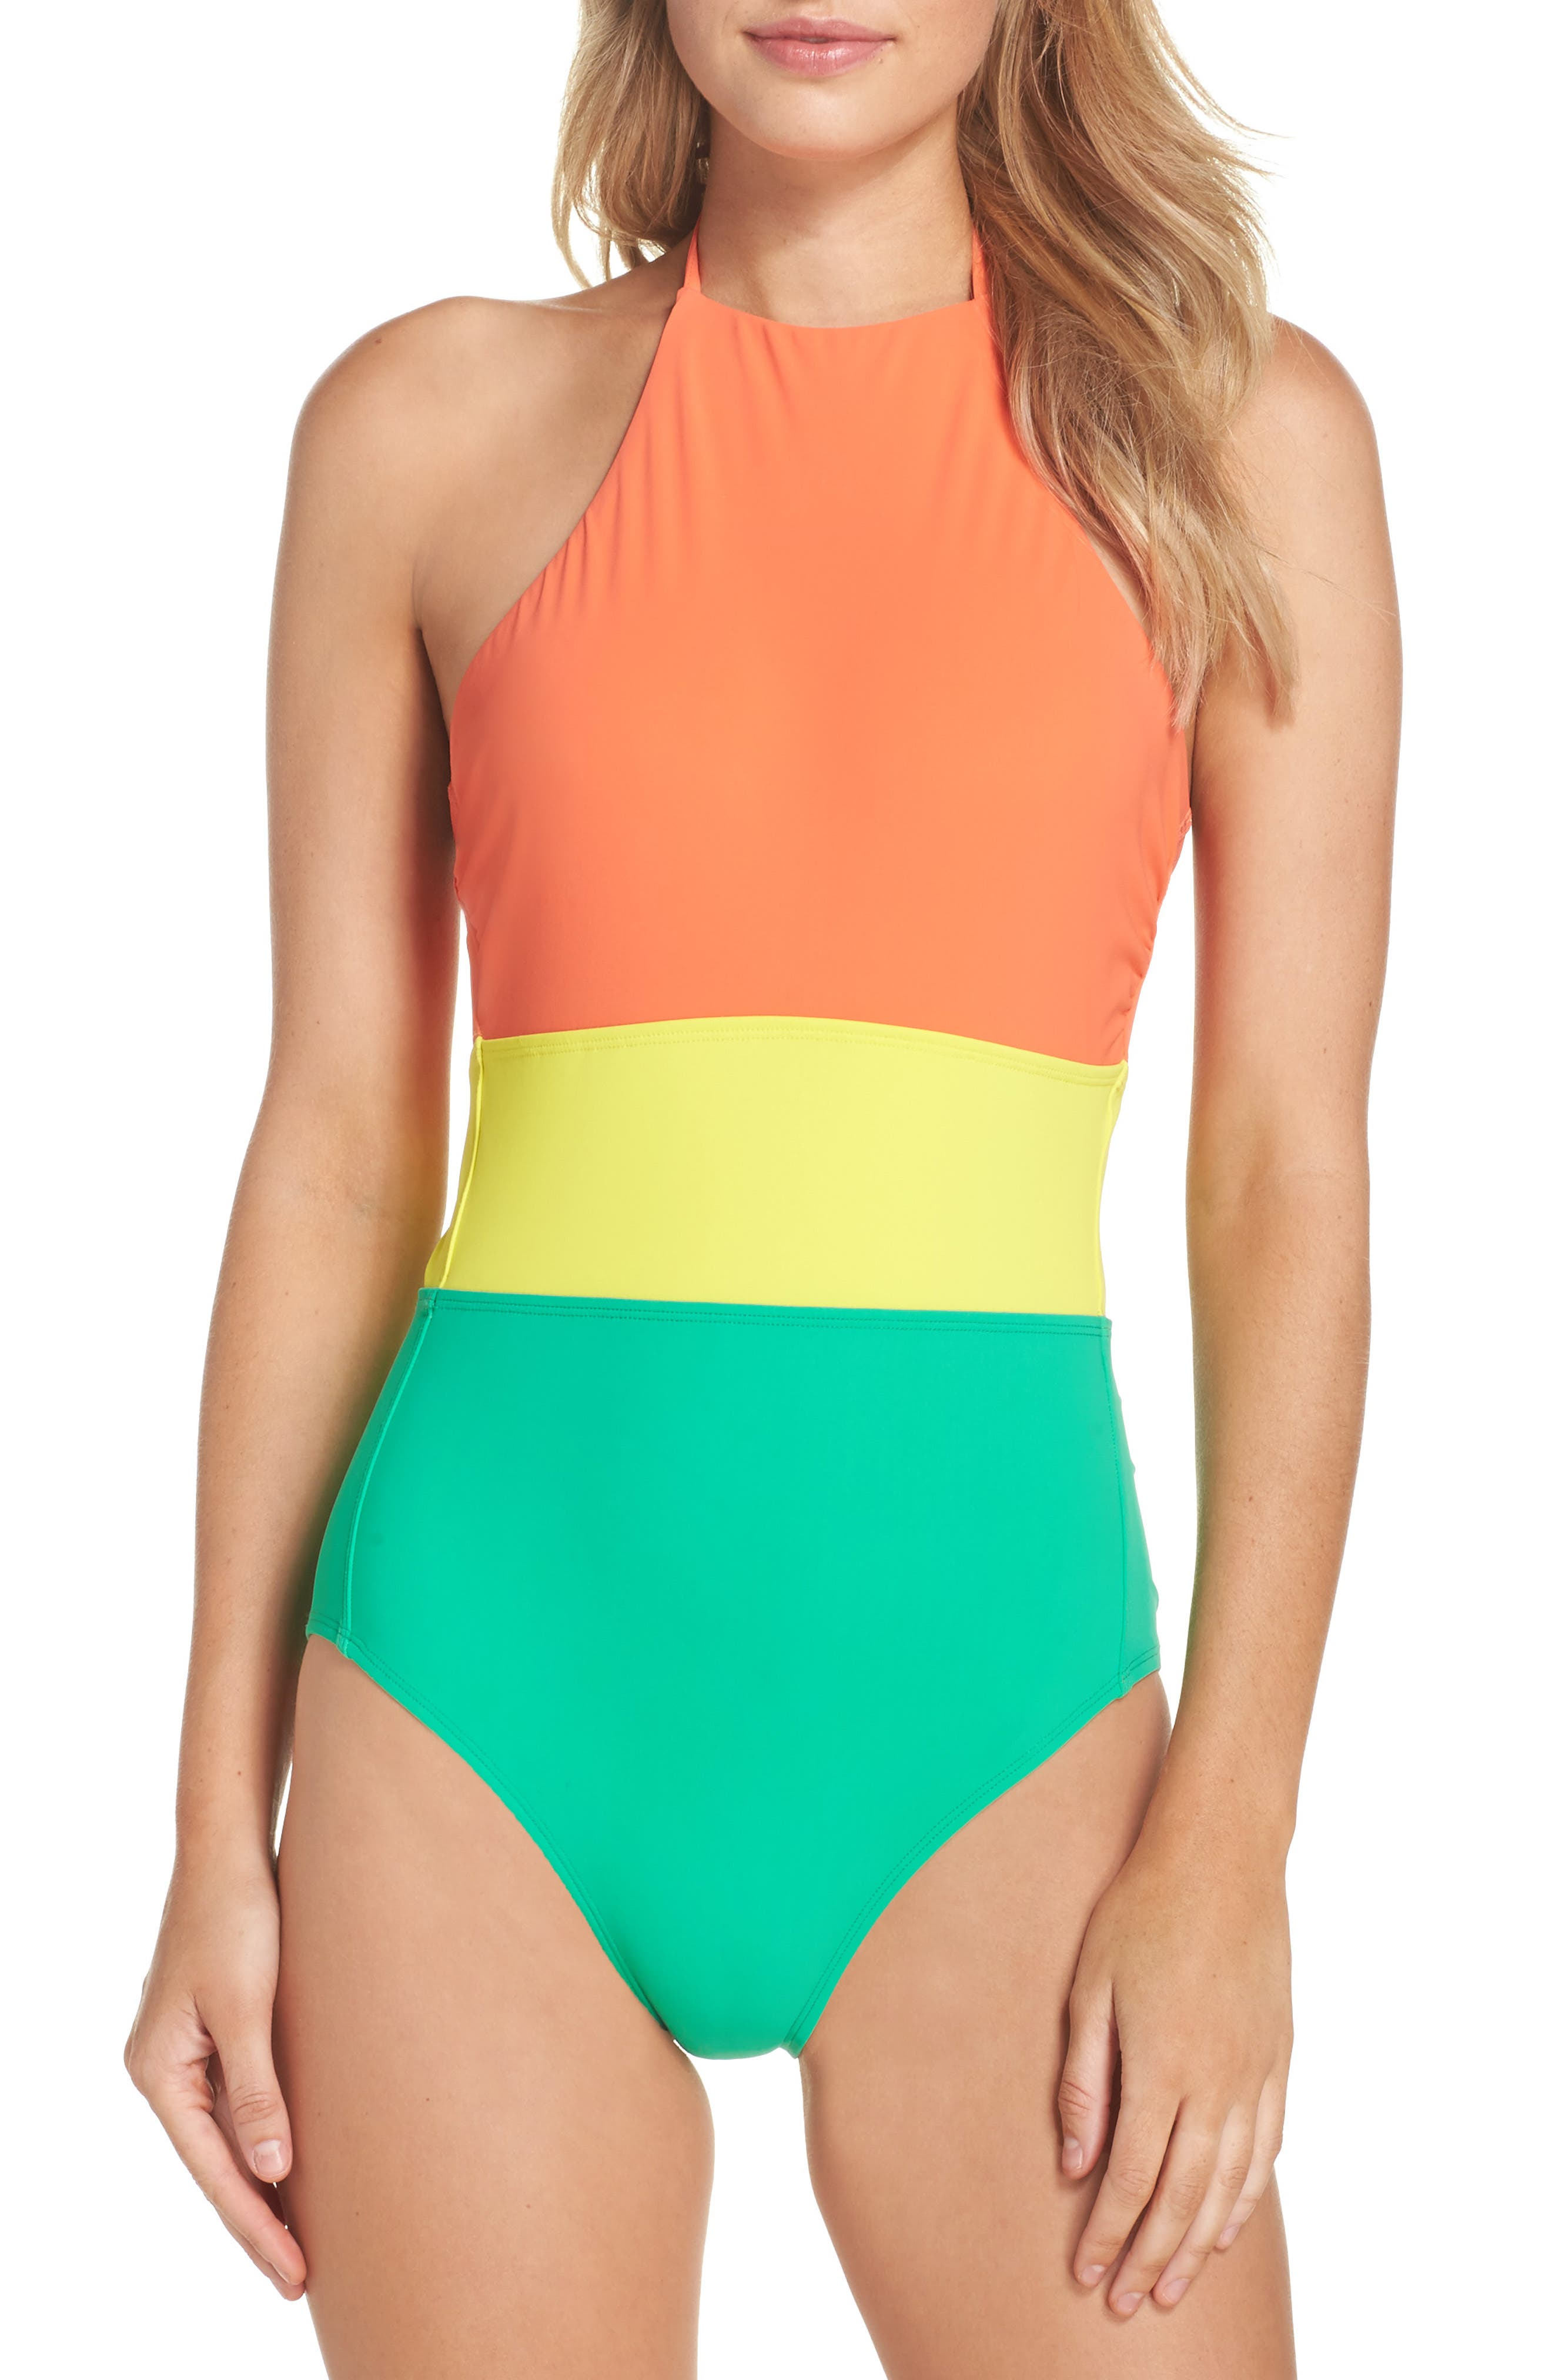 Halter One-Piece Swimsuit,                             Main thumbnail 1, color,                             Coral/ Acid